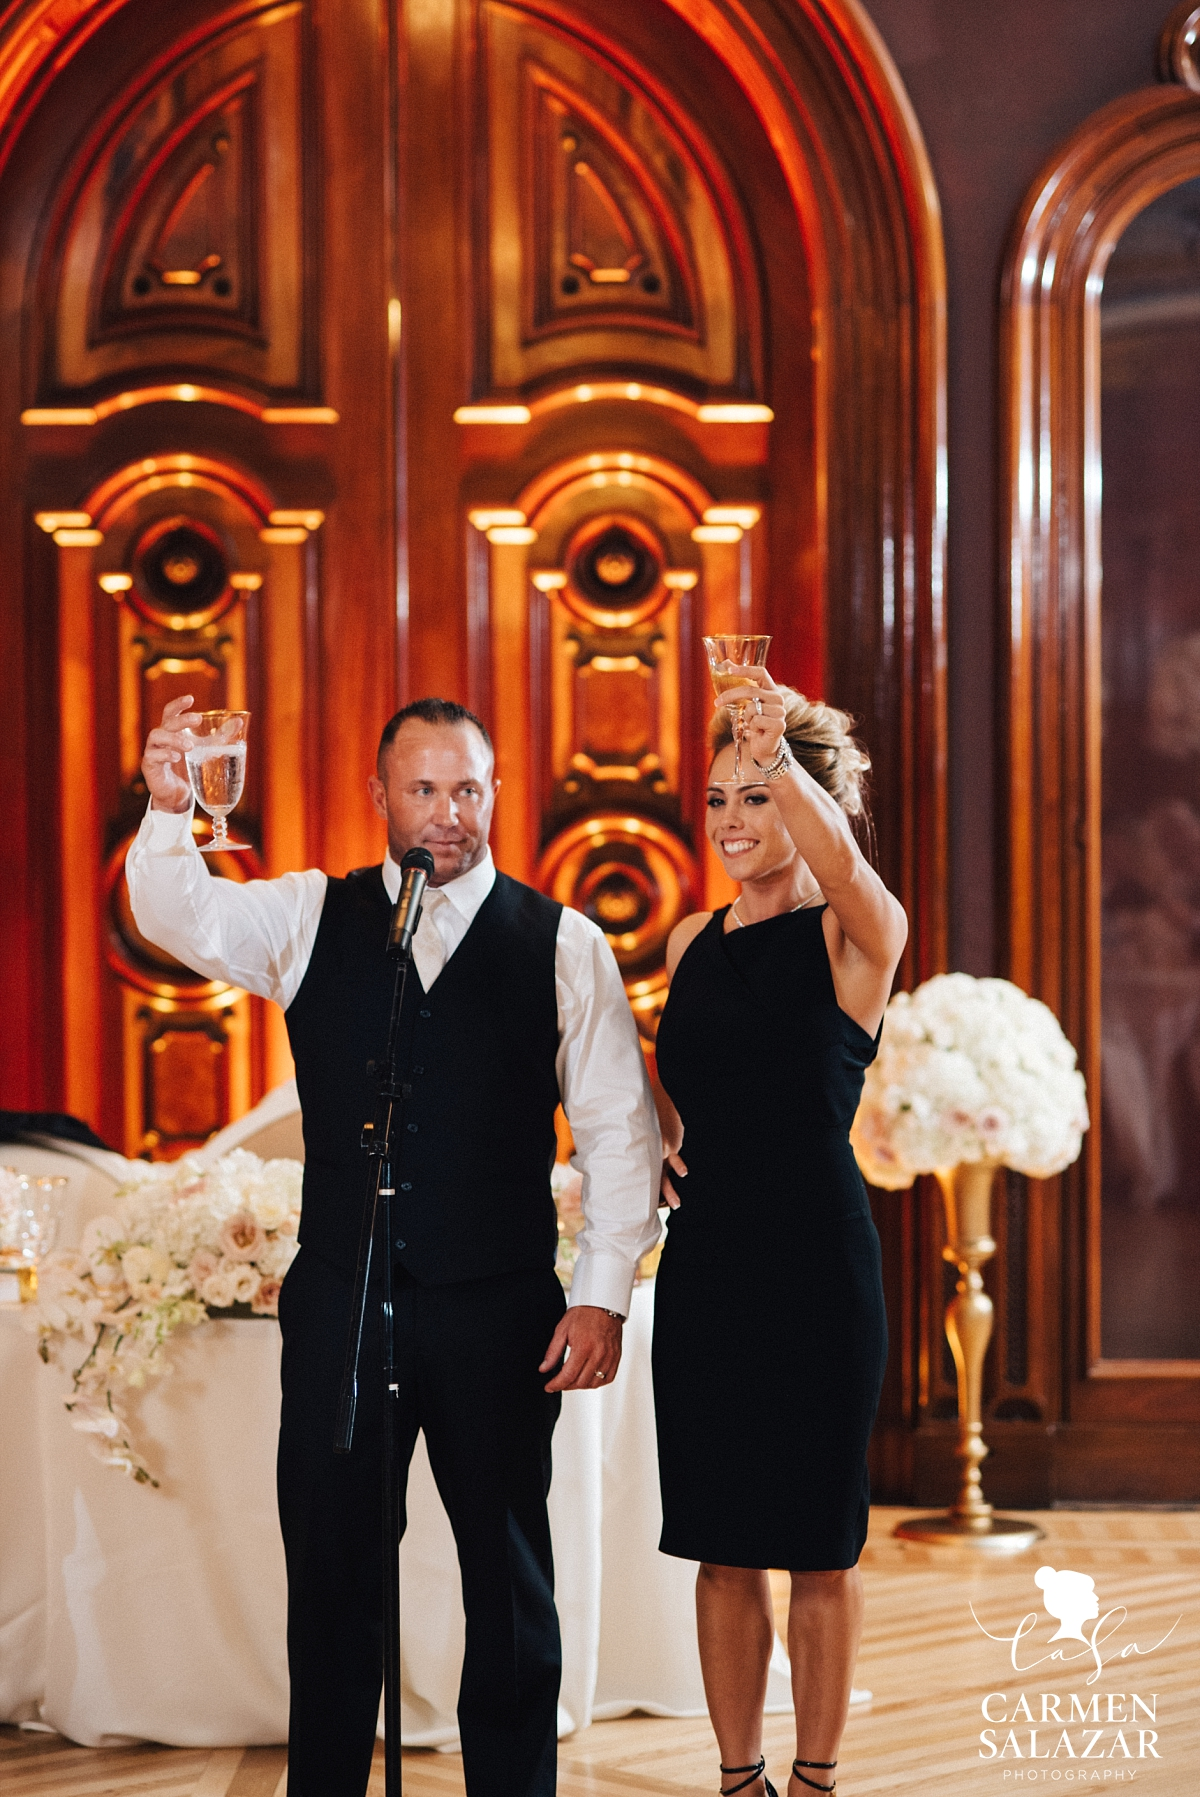 Bride and groom toasting at art museum reception - Carmen Salazar